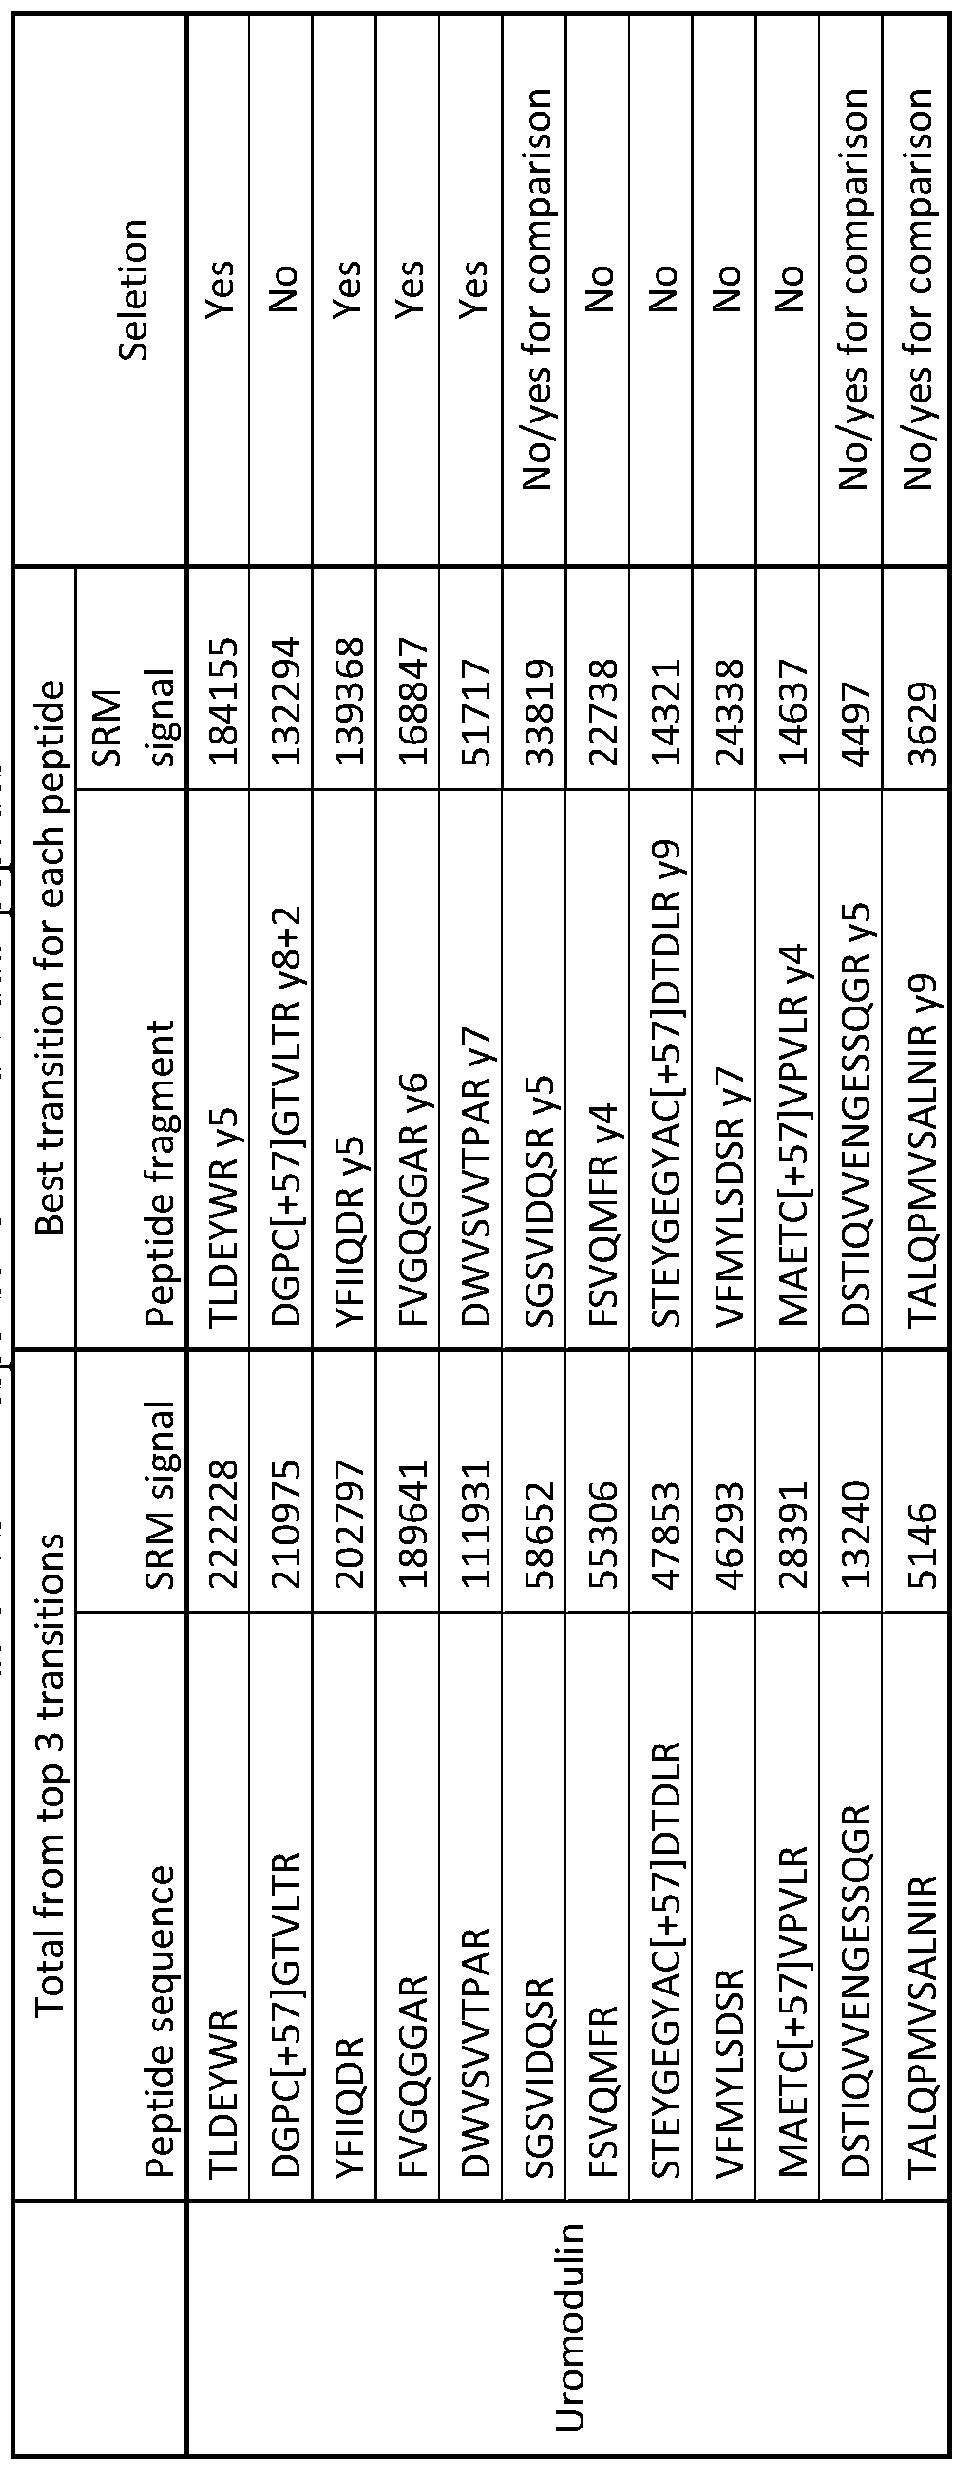 WO2016196522A1 - Correlated peptides for quantitative mass